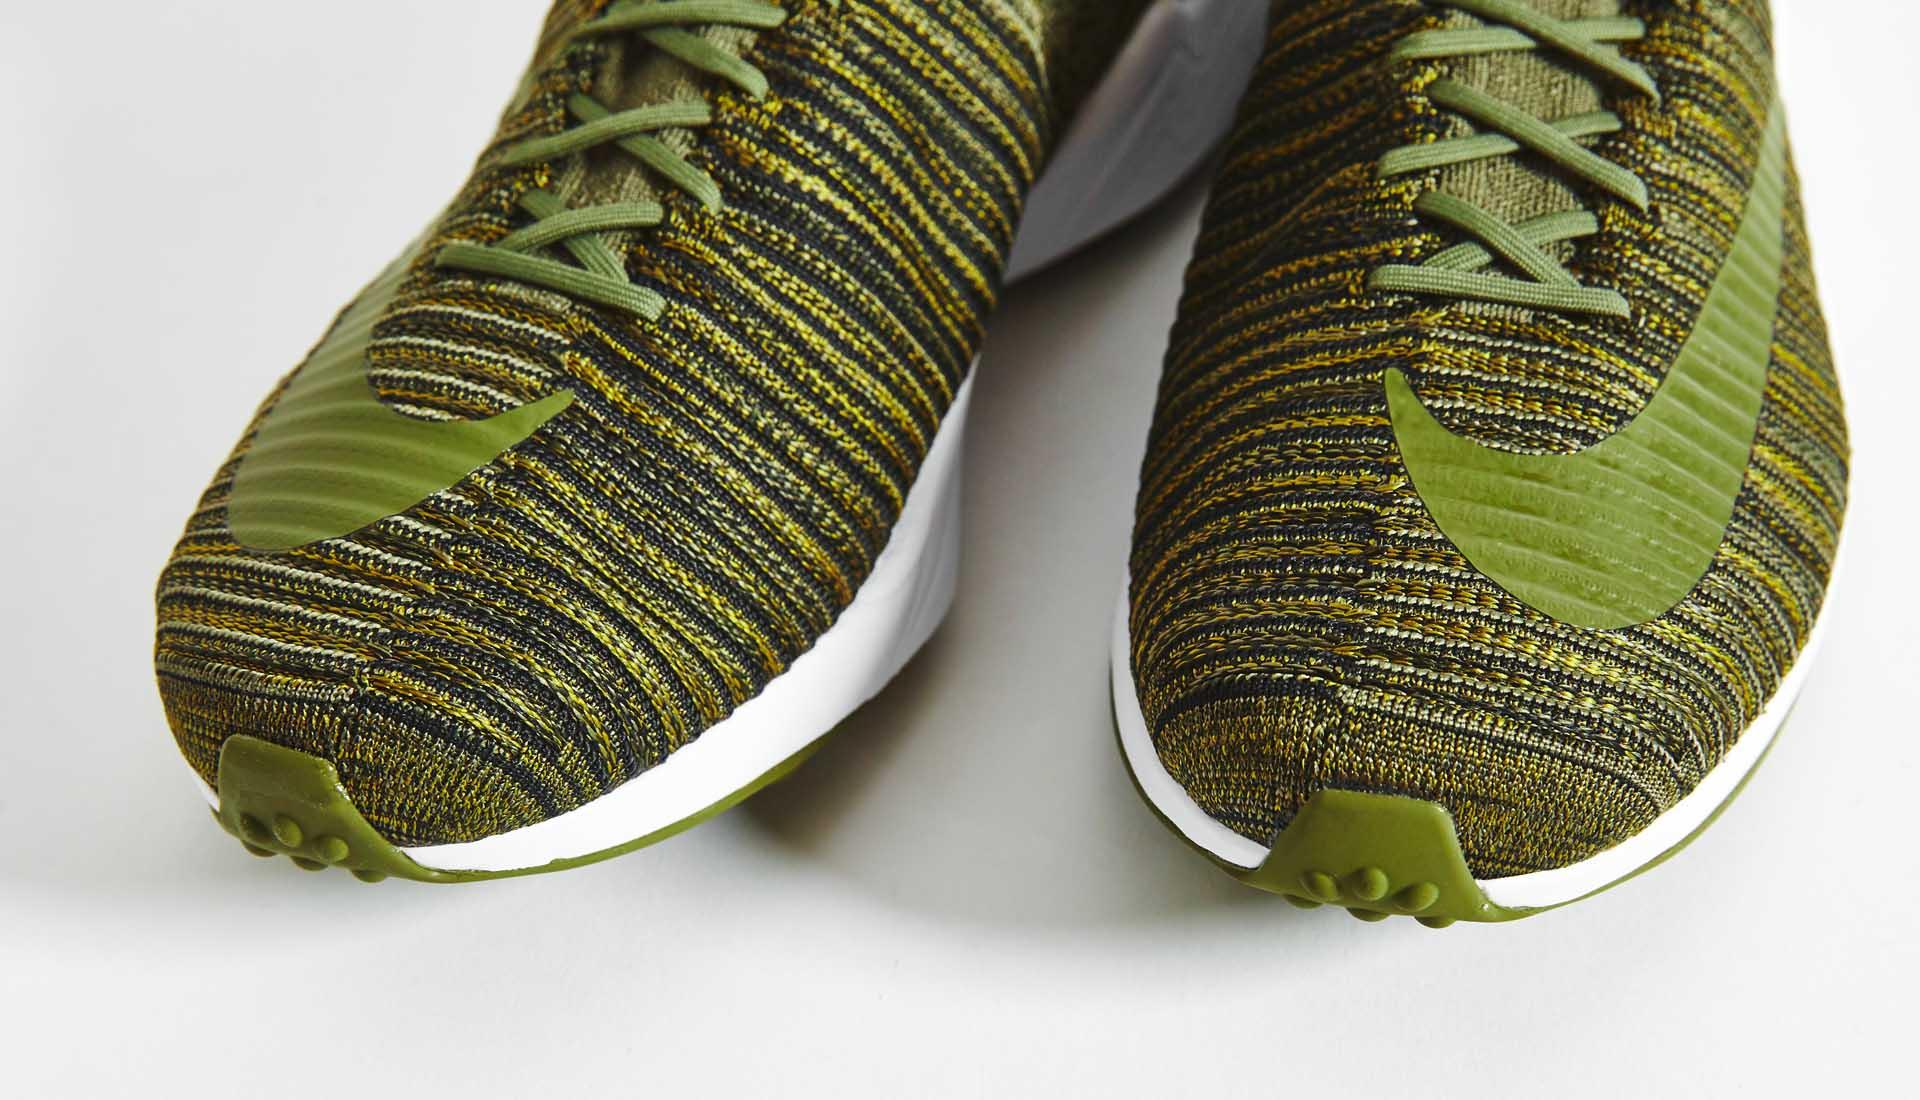 Turf Empire Nike Mercurial Zoom Flyknit Olive .jpg